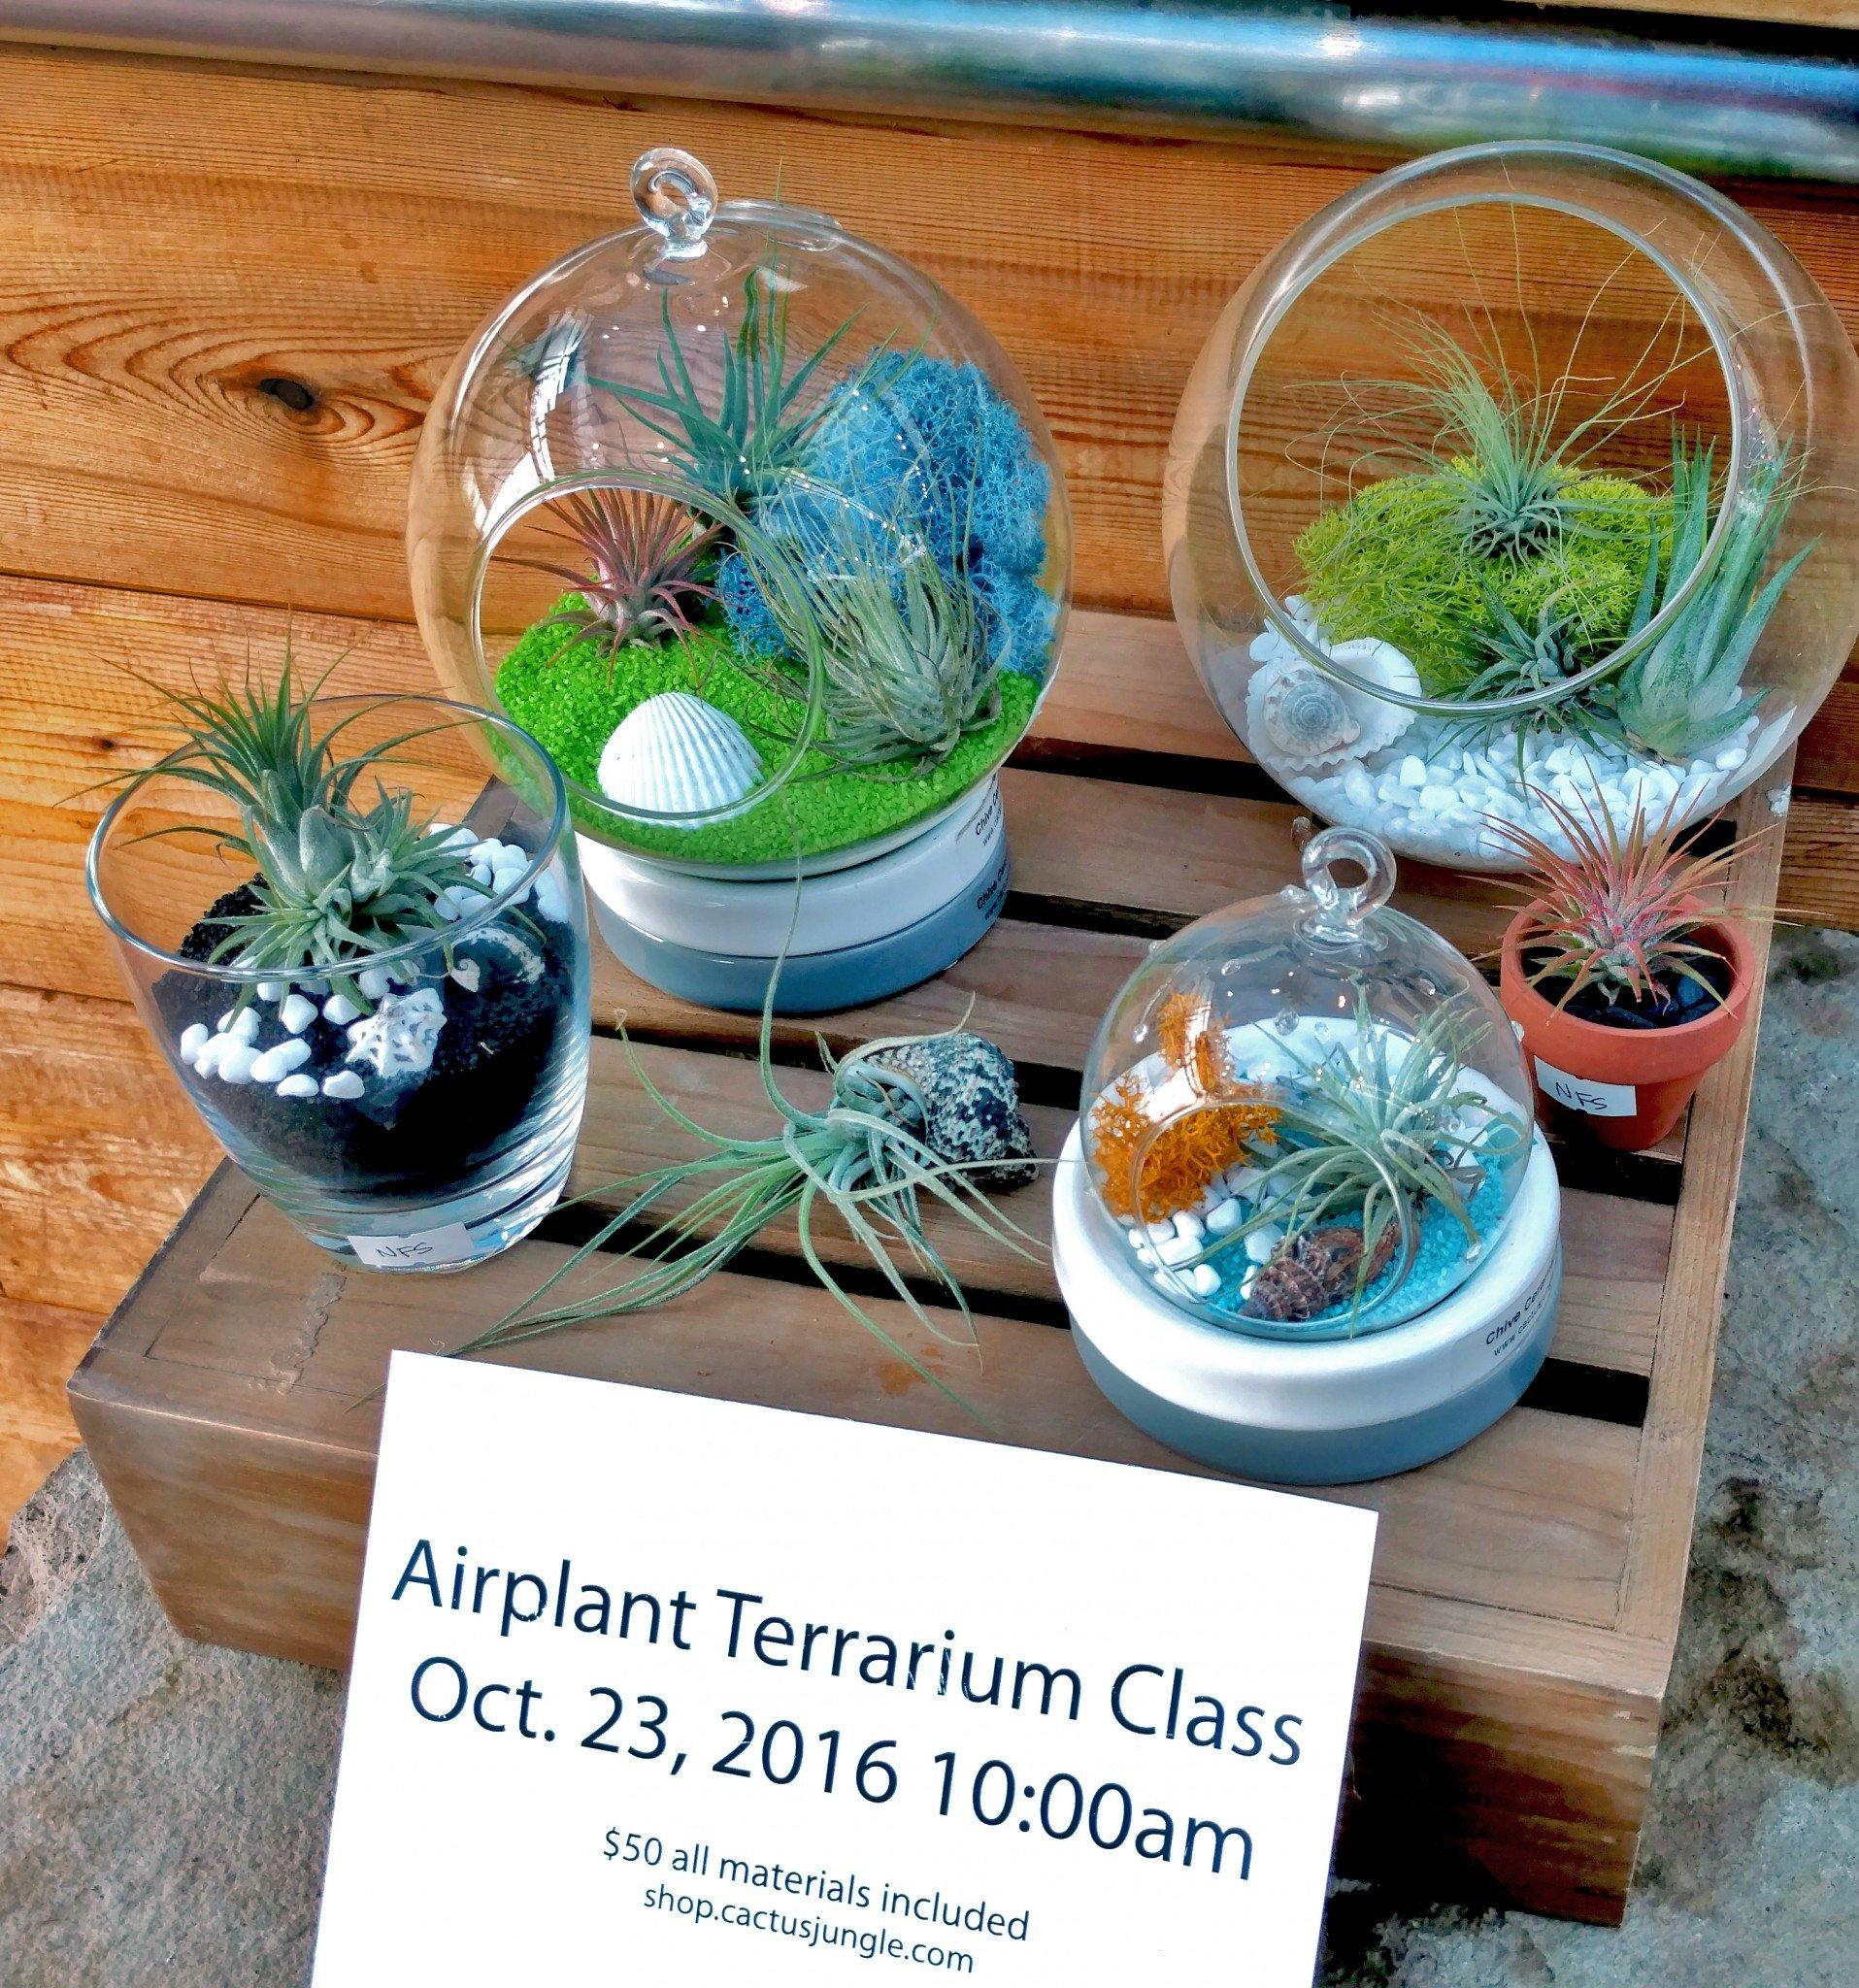 airplant_terrarium_class